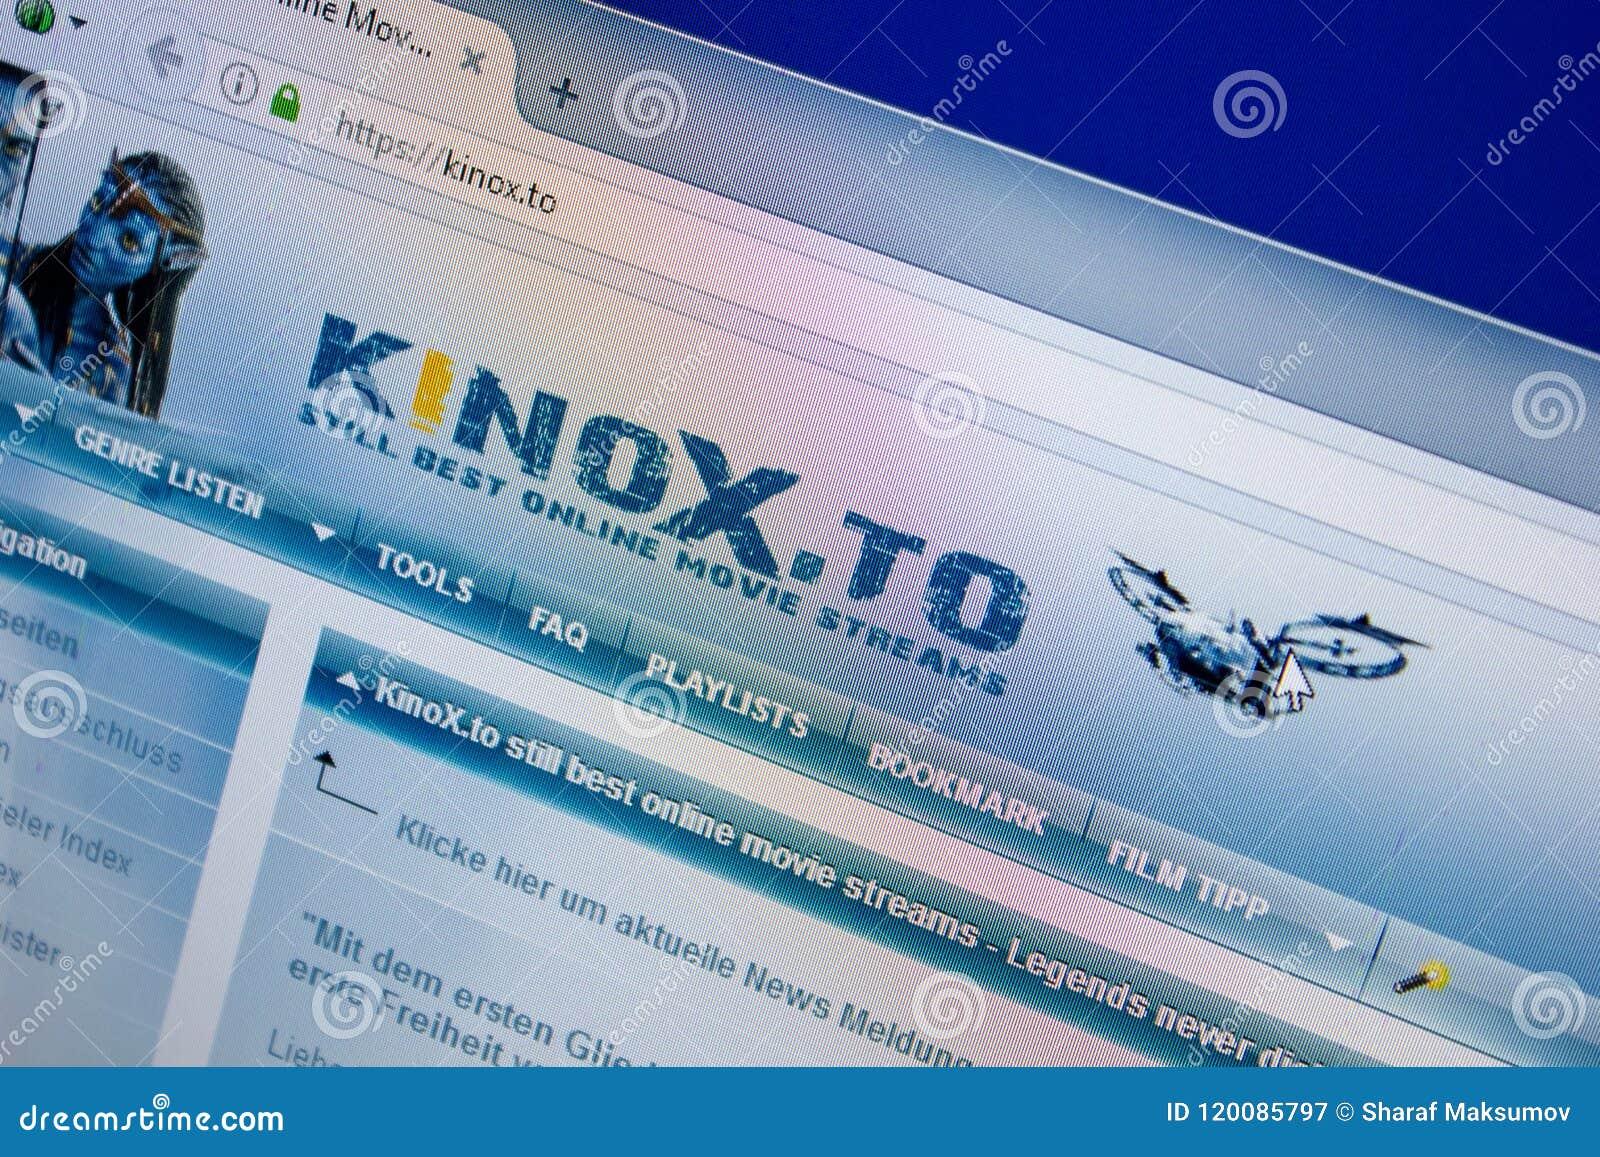 kinox url